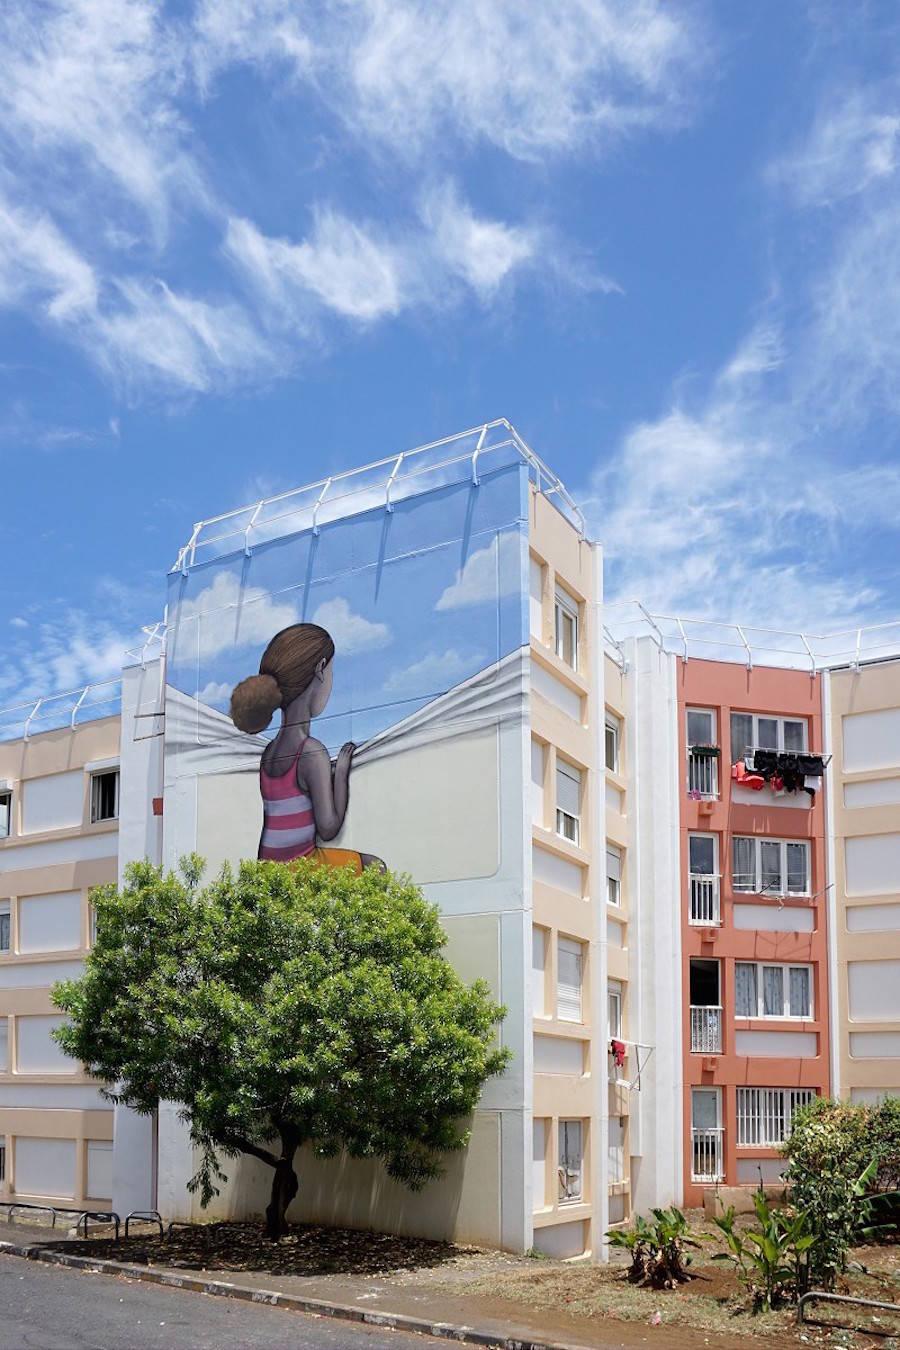 Poetic Street Art in Reunion Island